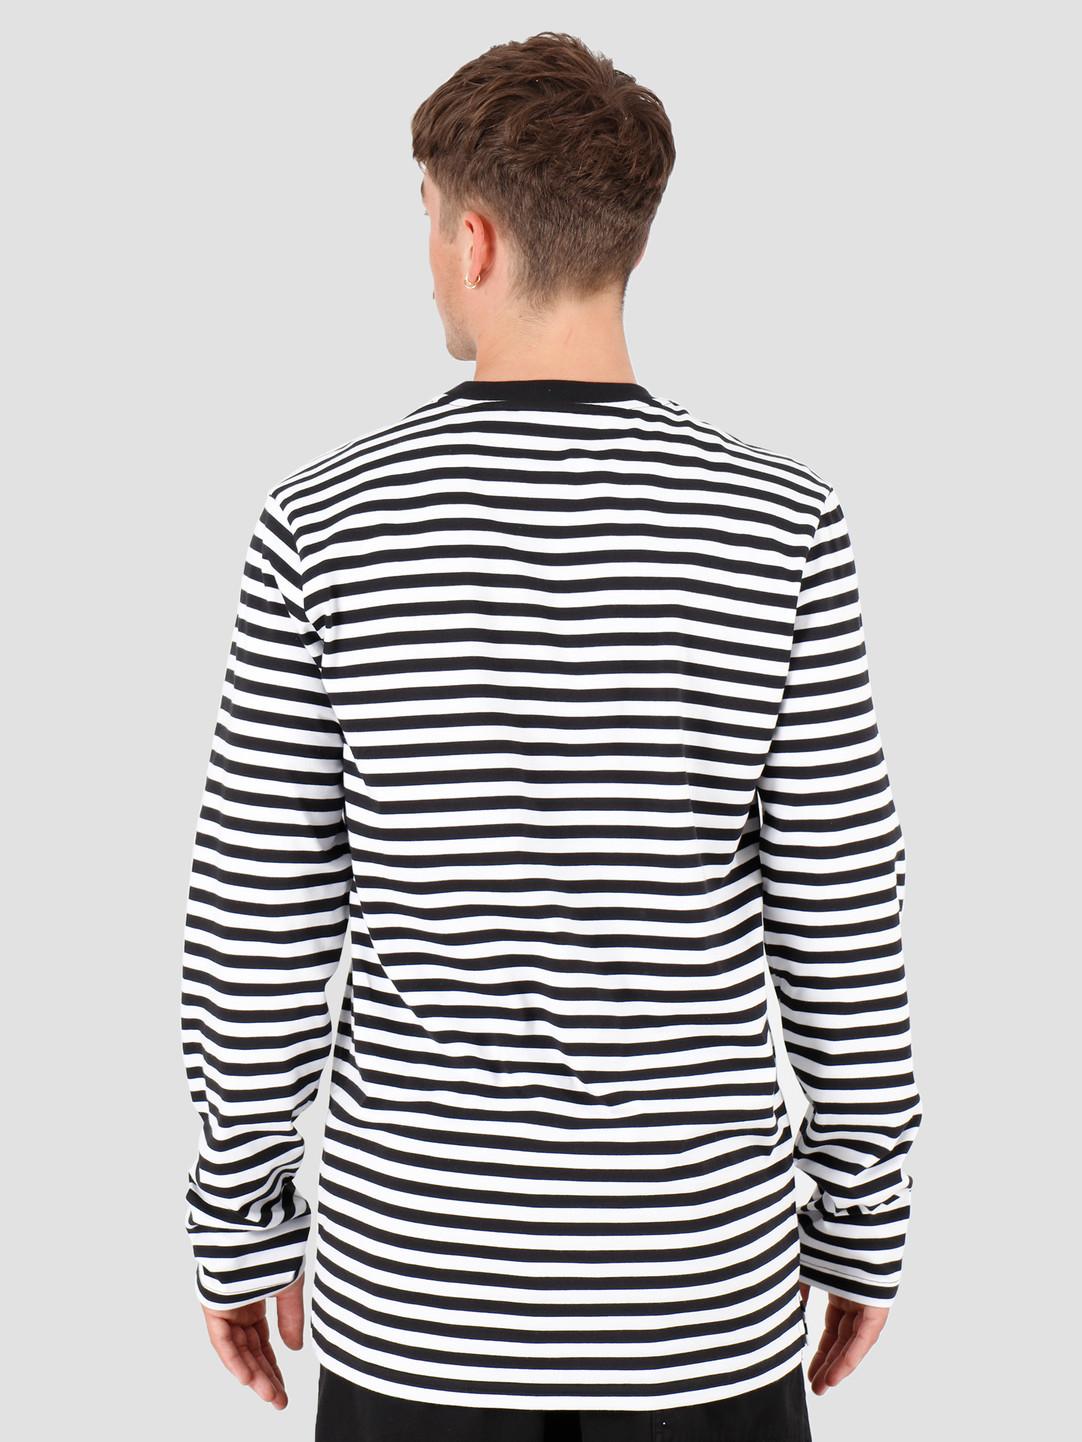 HUF HUF Morris Longsleeve Knit Top Black KN00158-BLACK